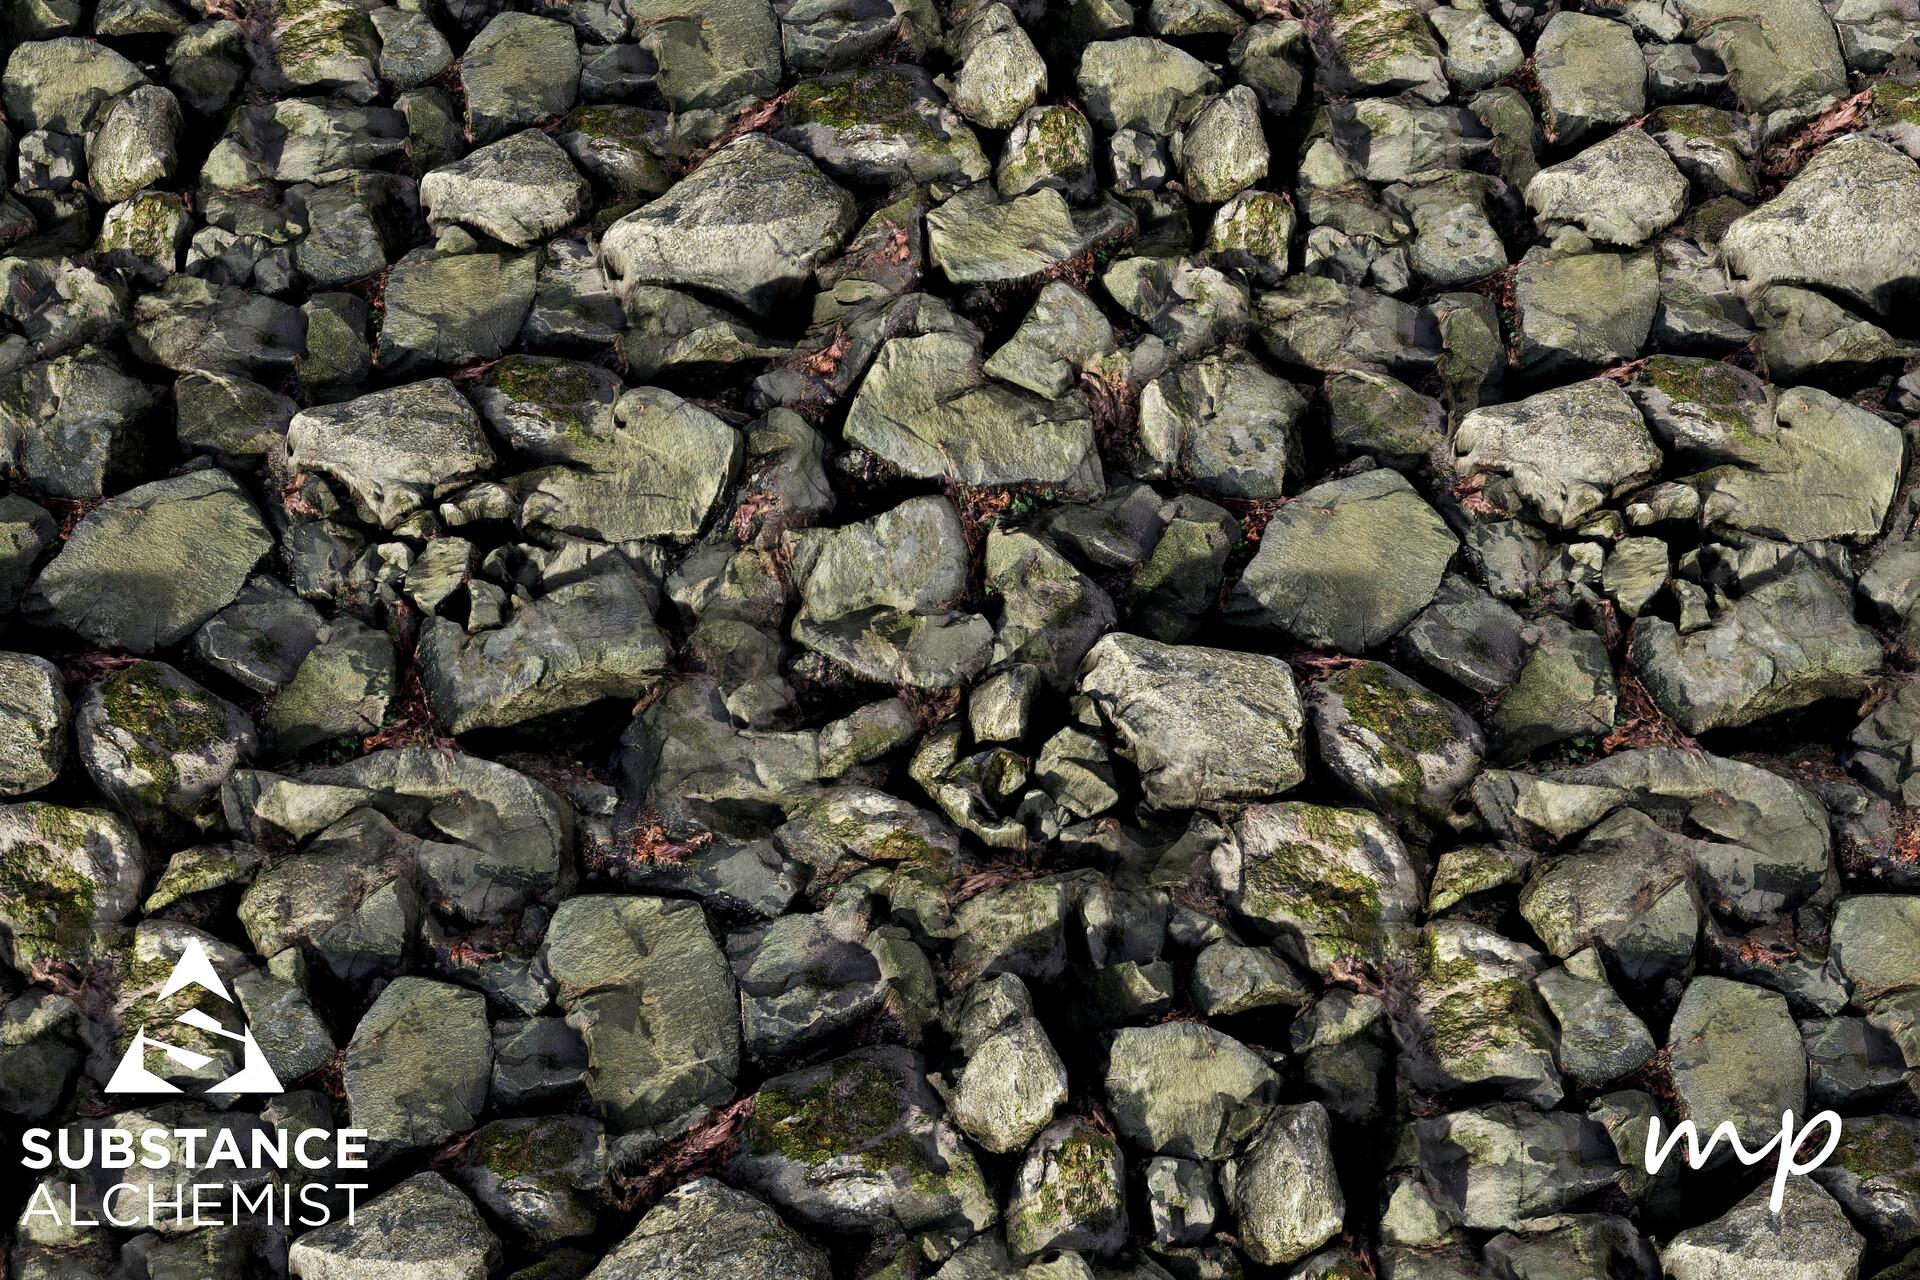 Martin pietras photogrammetry rocks plane 01